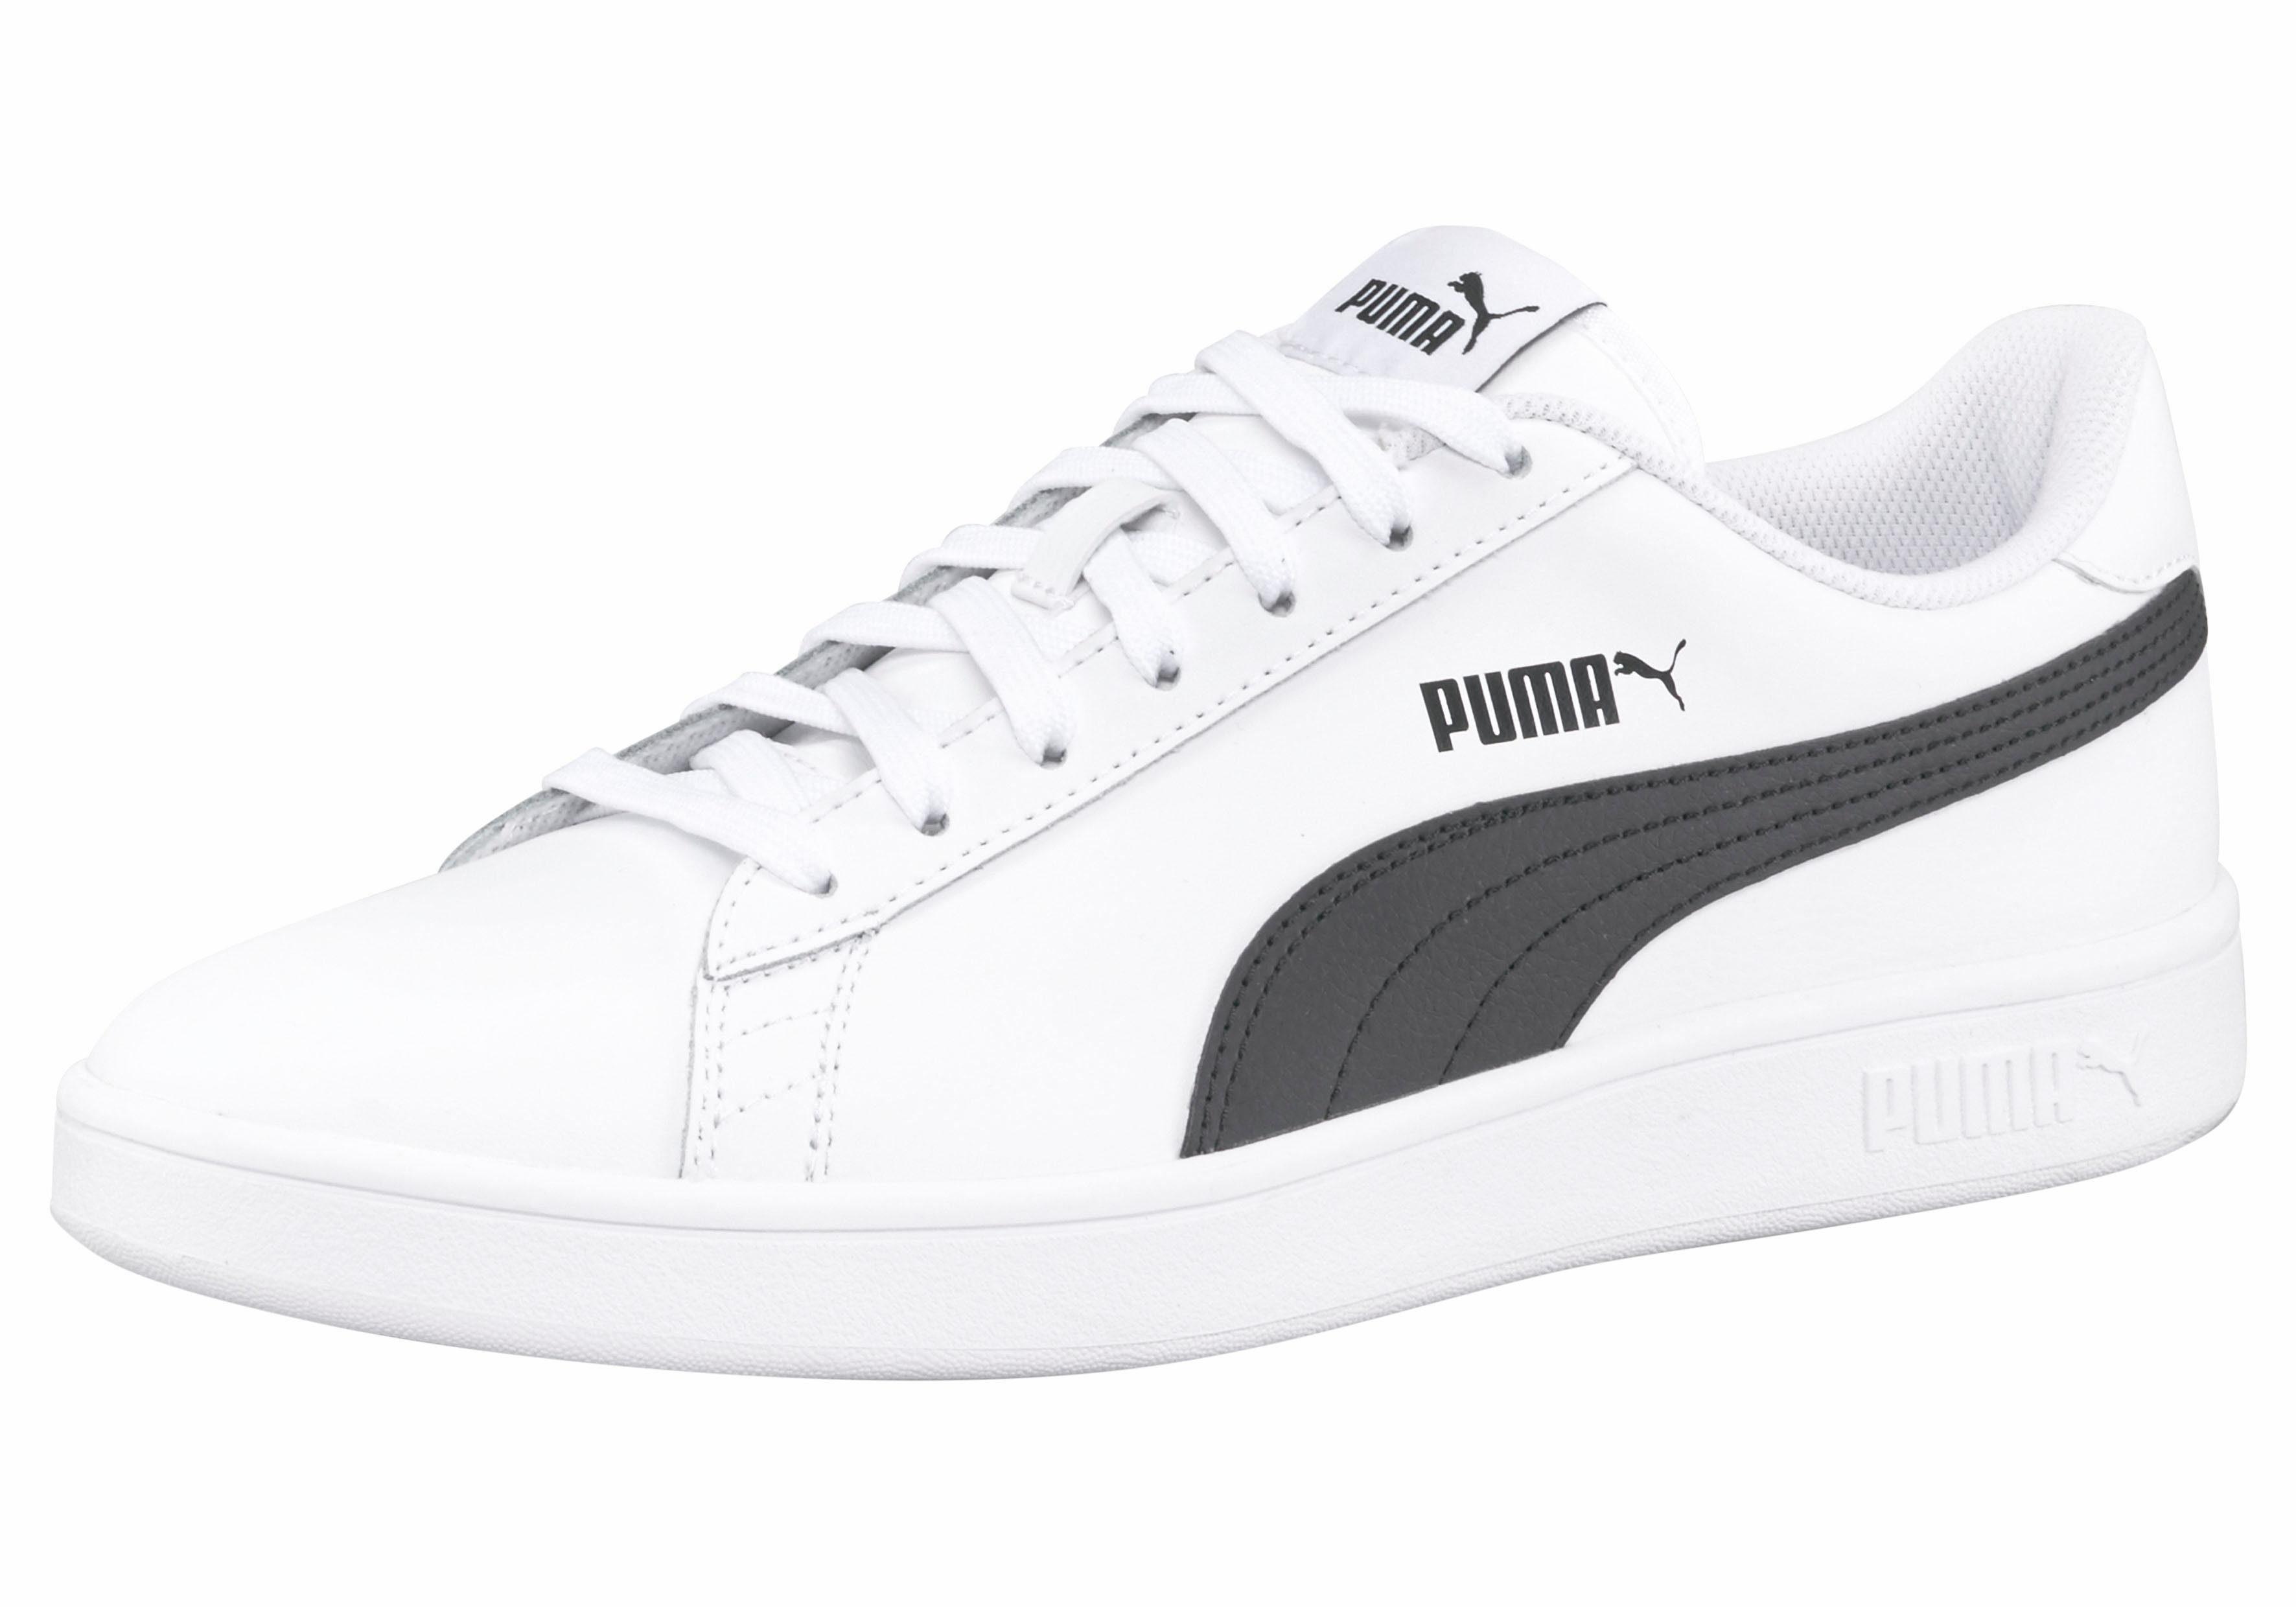 Puma Chaussures Blanches Pour Les Hommes Pension VF6pPh94n0